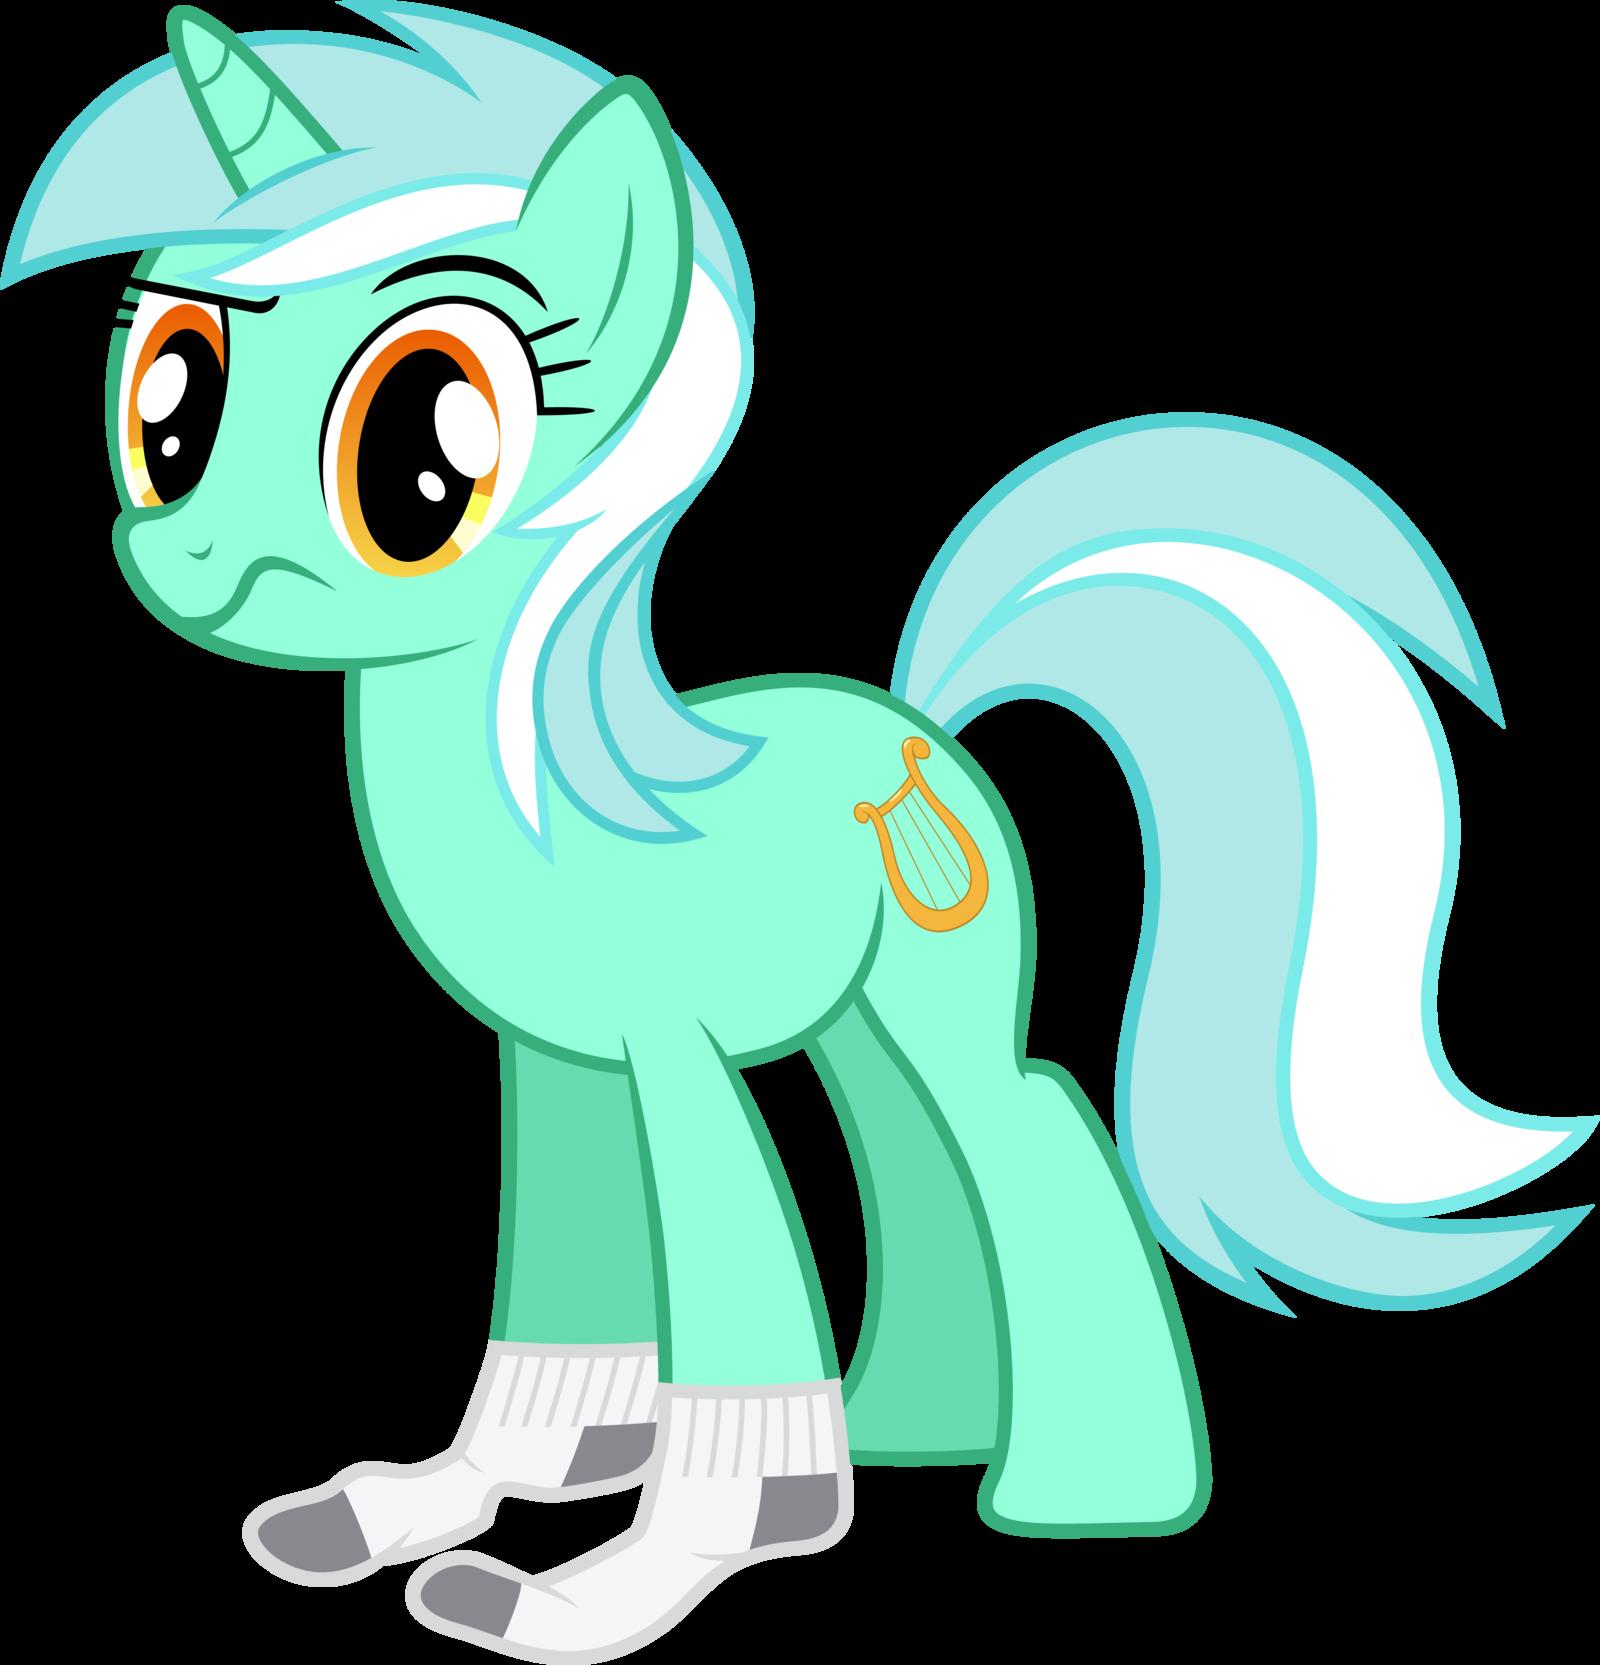 Pone with socks re sexy (͡° ͜ʖ ͡°). .. Oh hot she's got socks on MLP Lyra